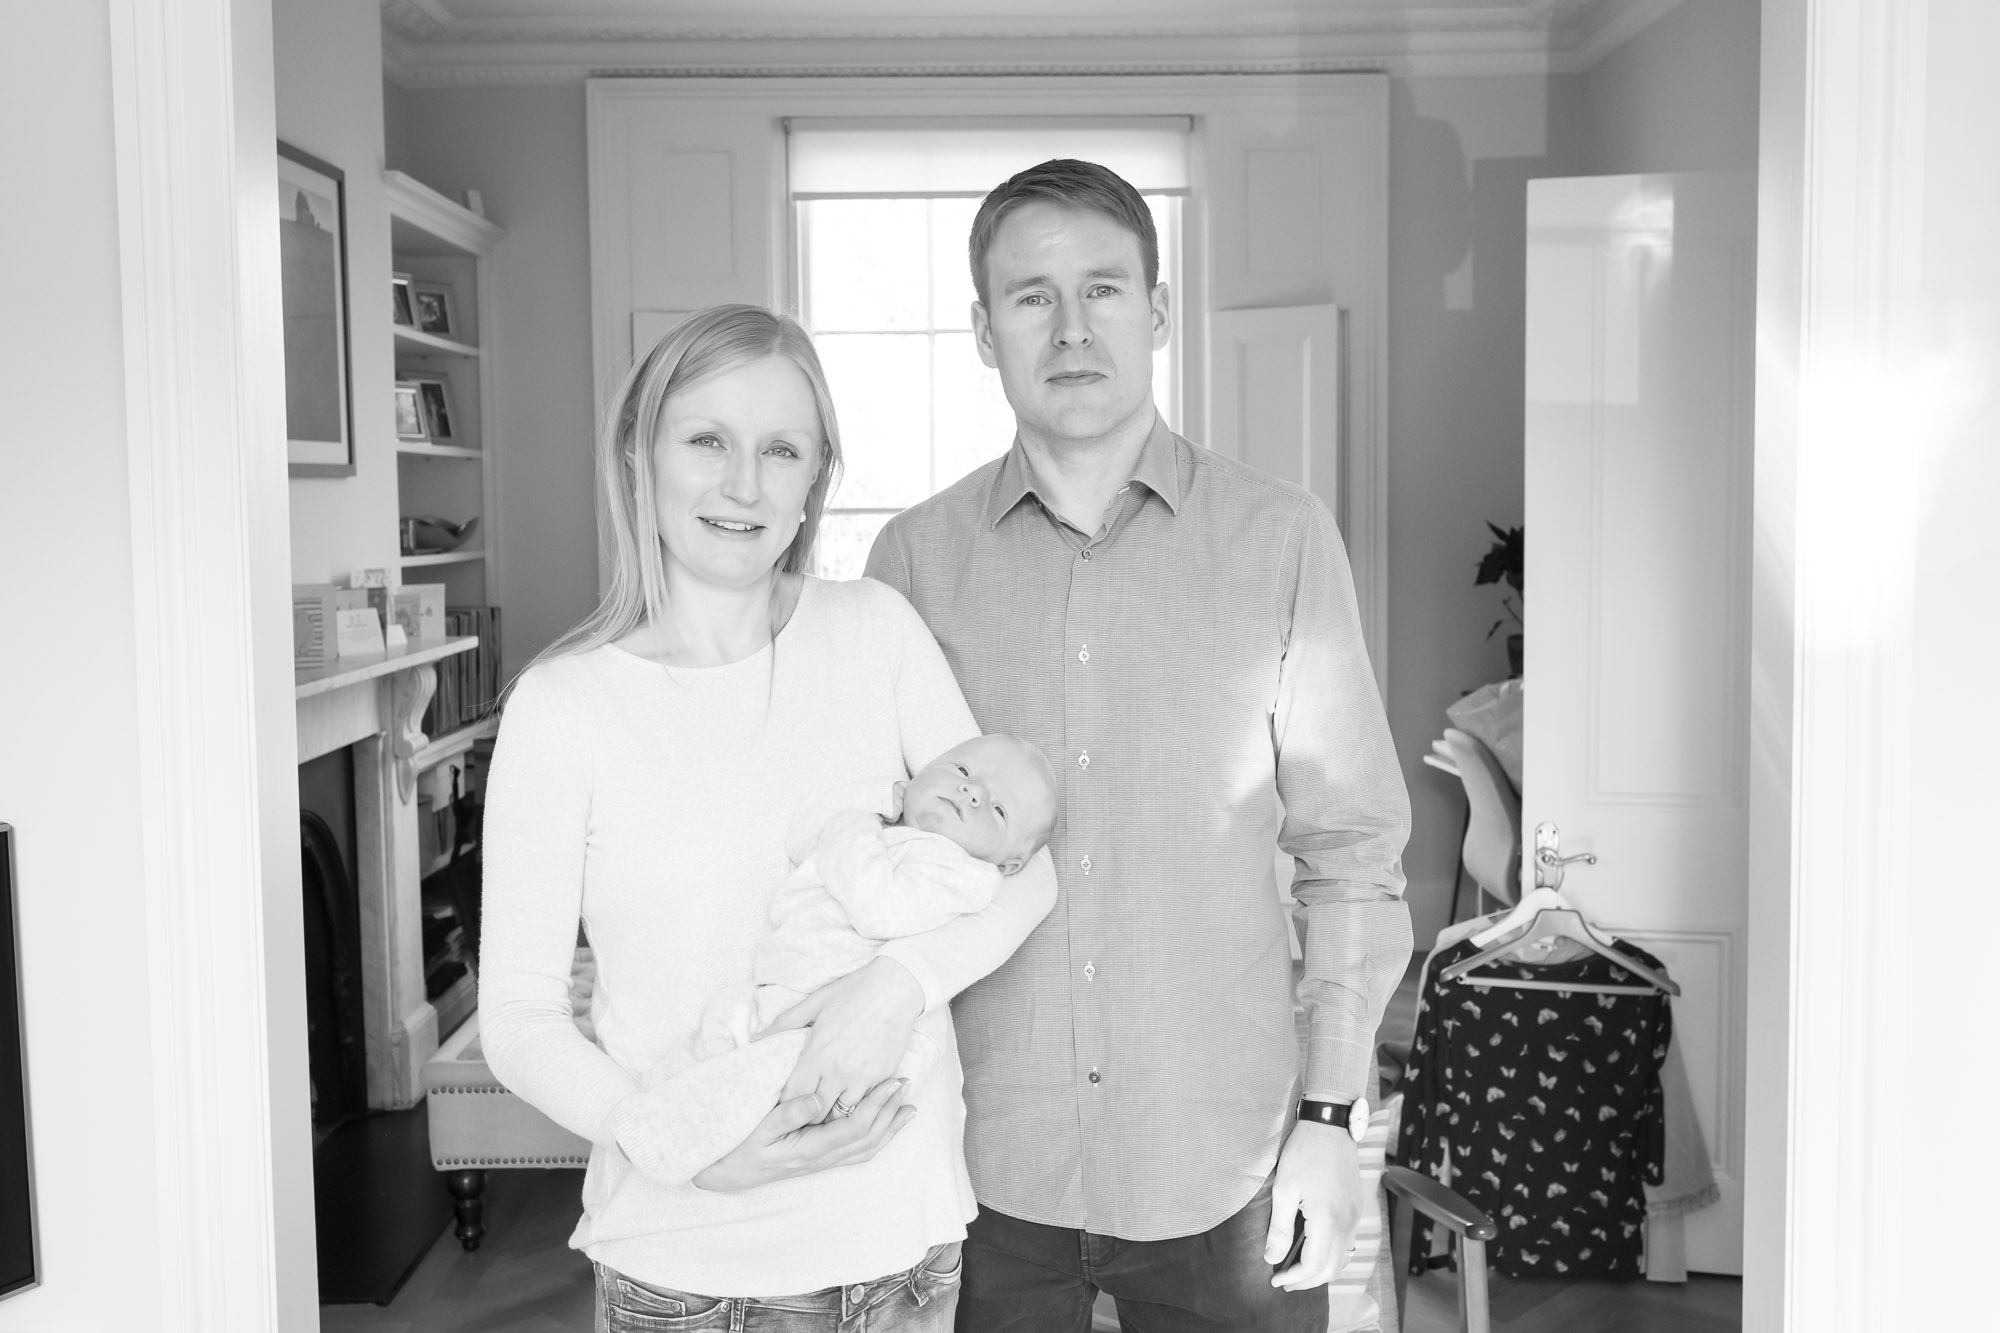 newborn-baby-family-portrait-photographer-029.jpg